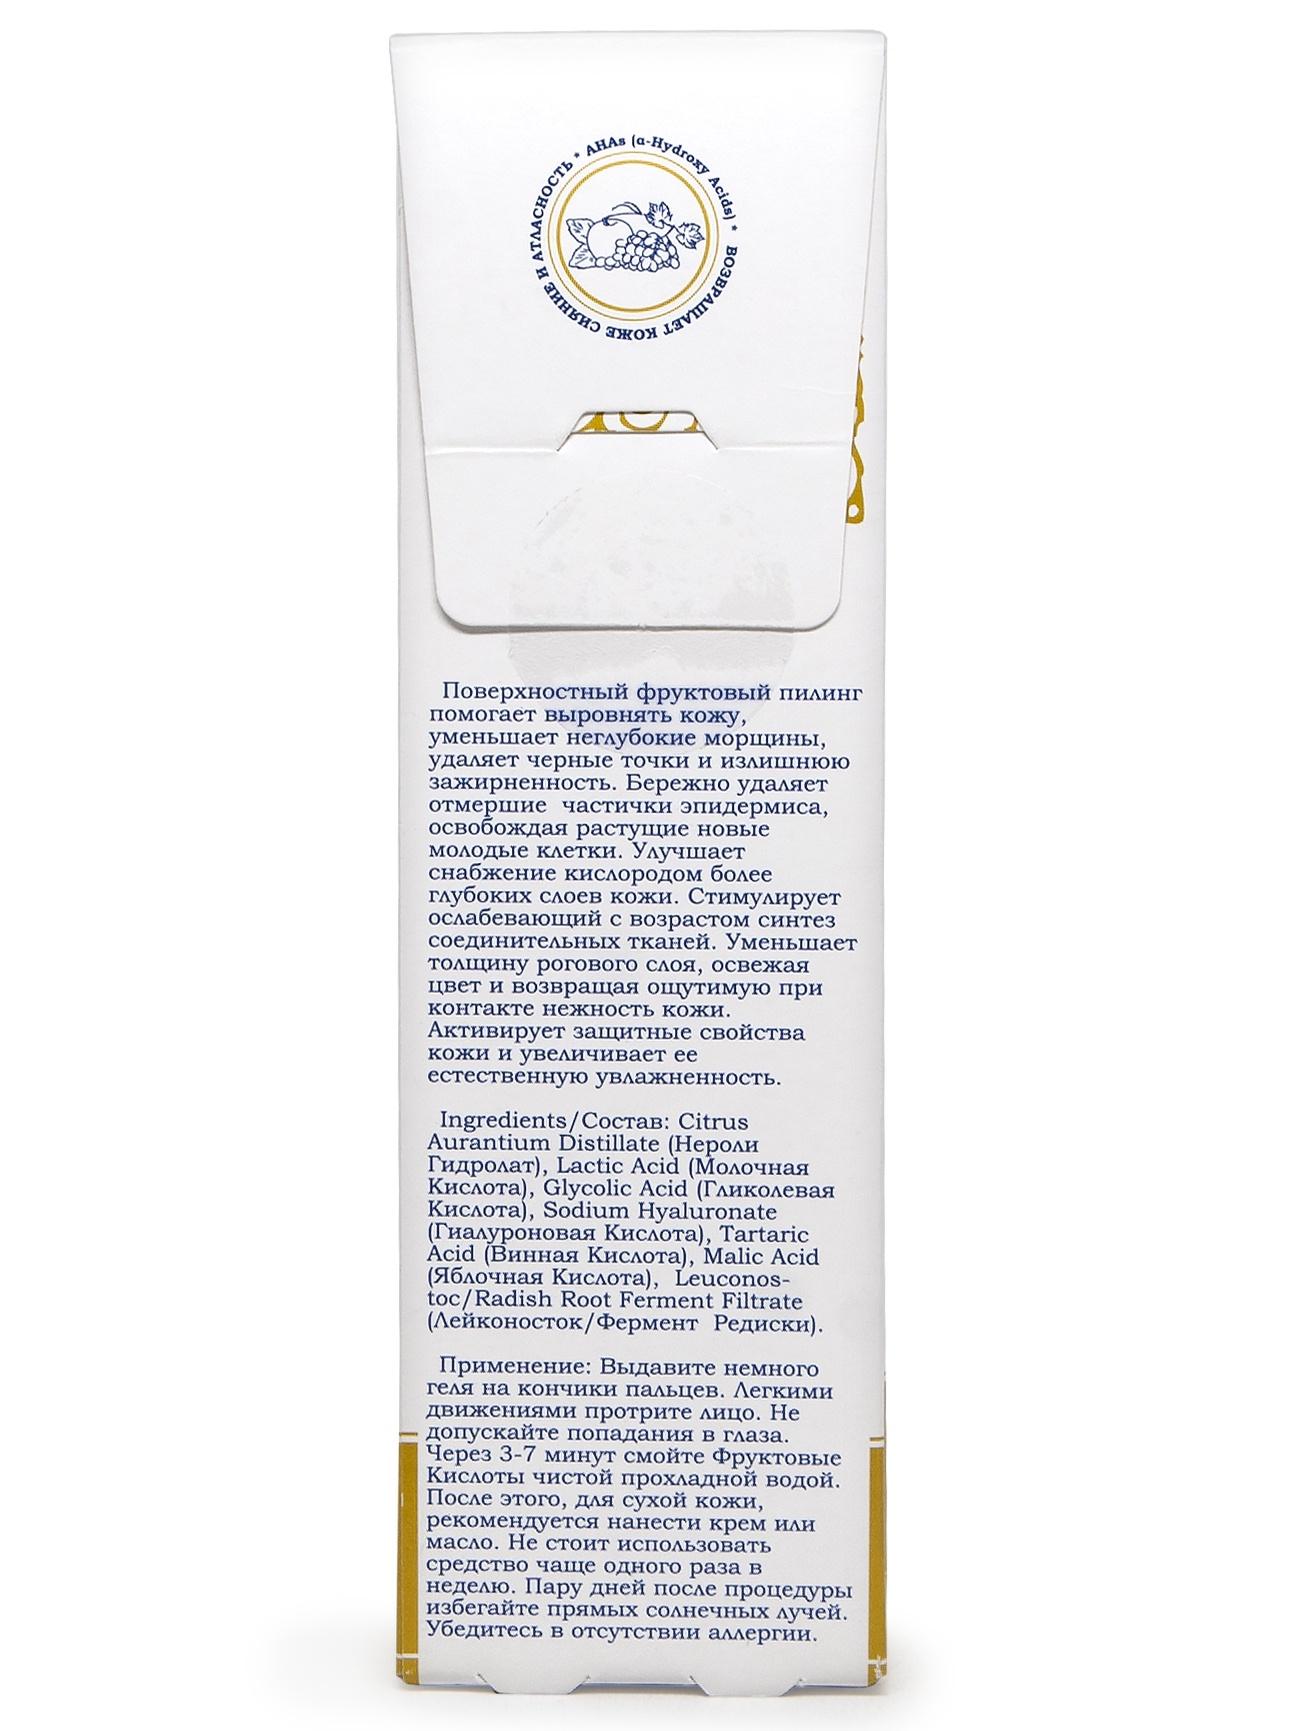 Фруктовая кислота (флакон-капелька) L'or 15мл DNC